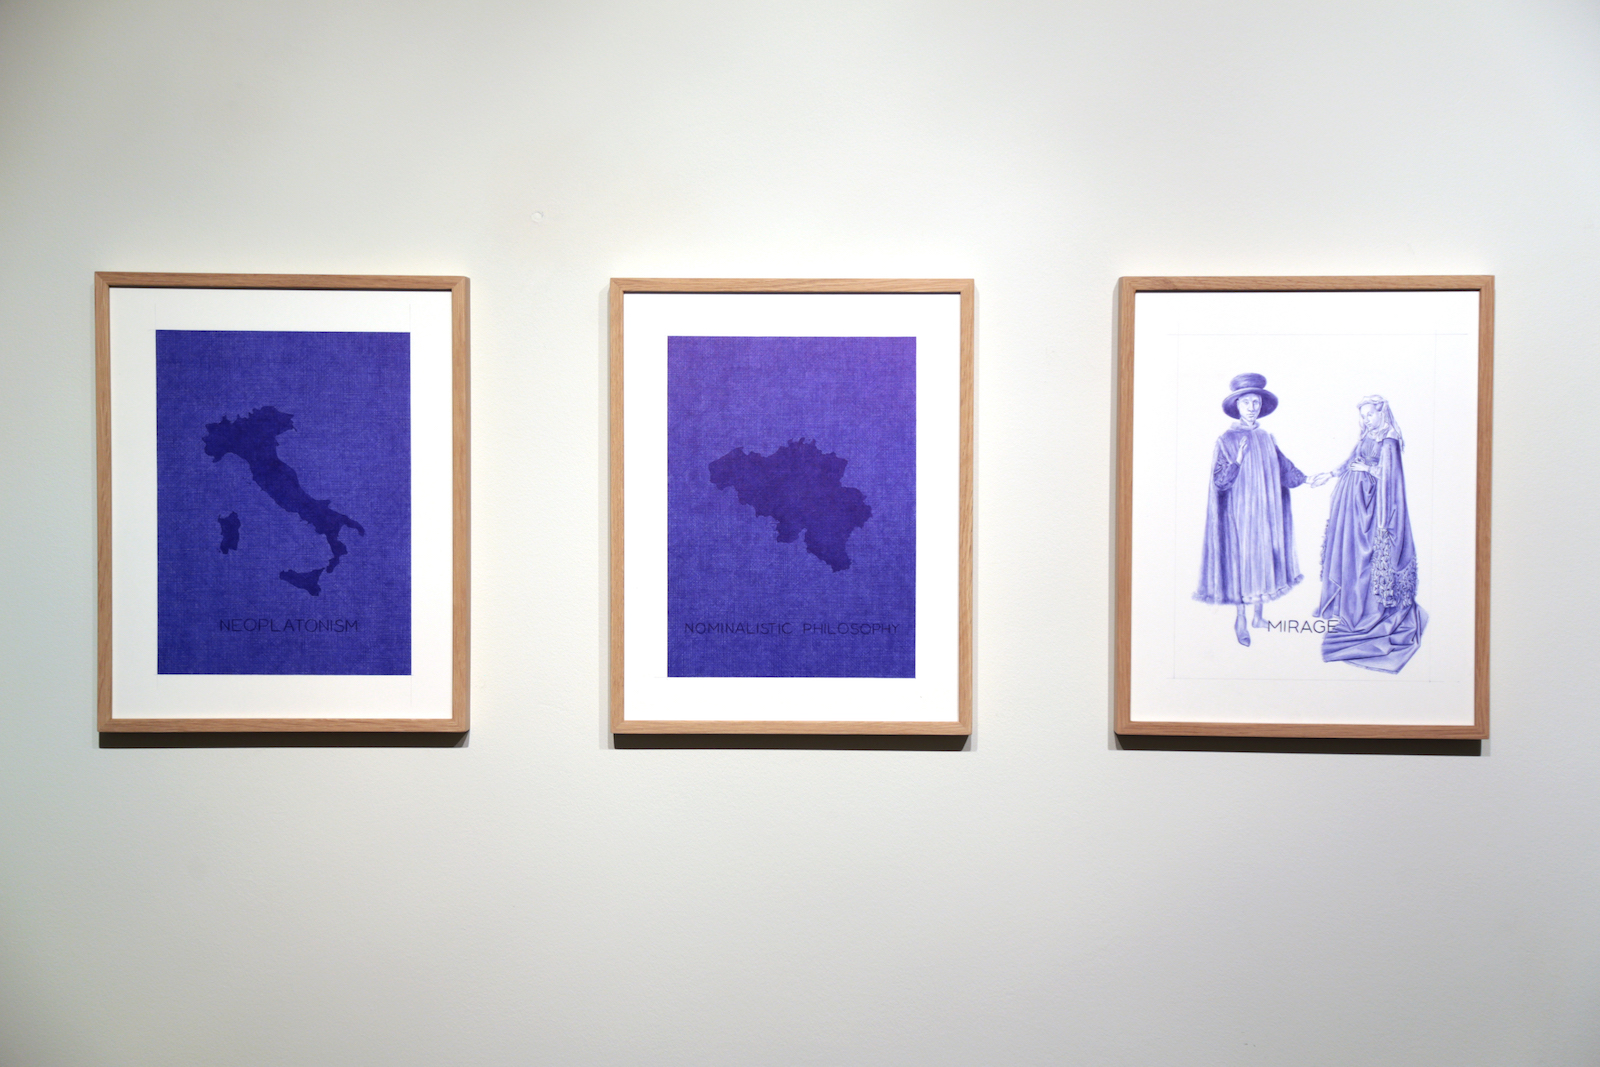 Tentative Ecouchee d'une peinture utopiste, 2016; 10 drawings bic pen on paper (particular)